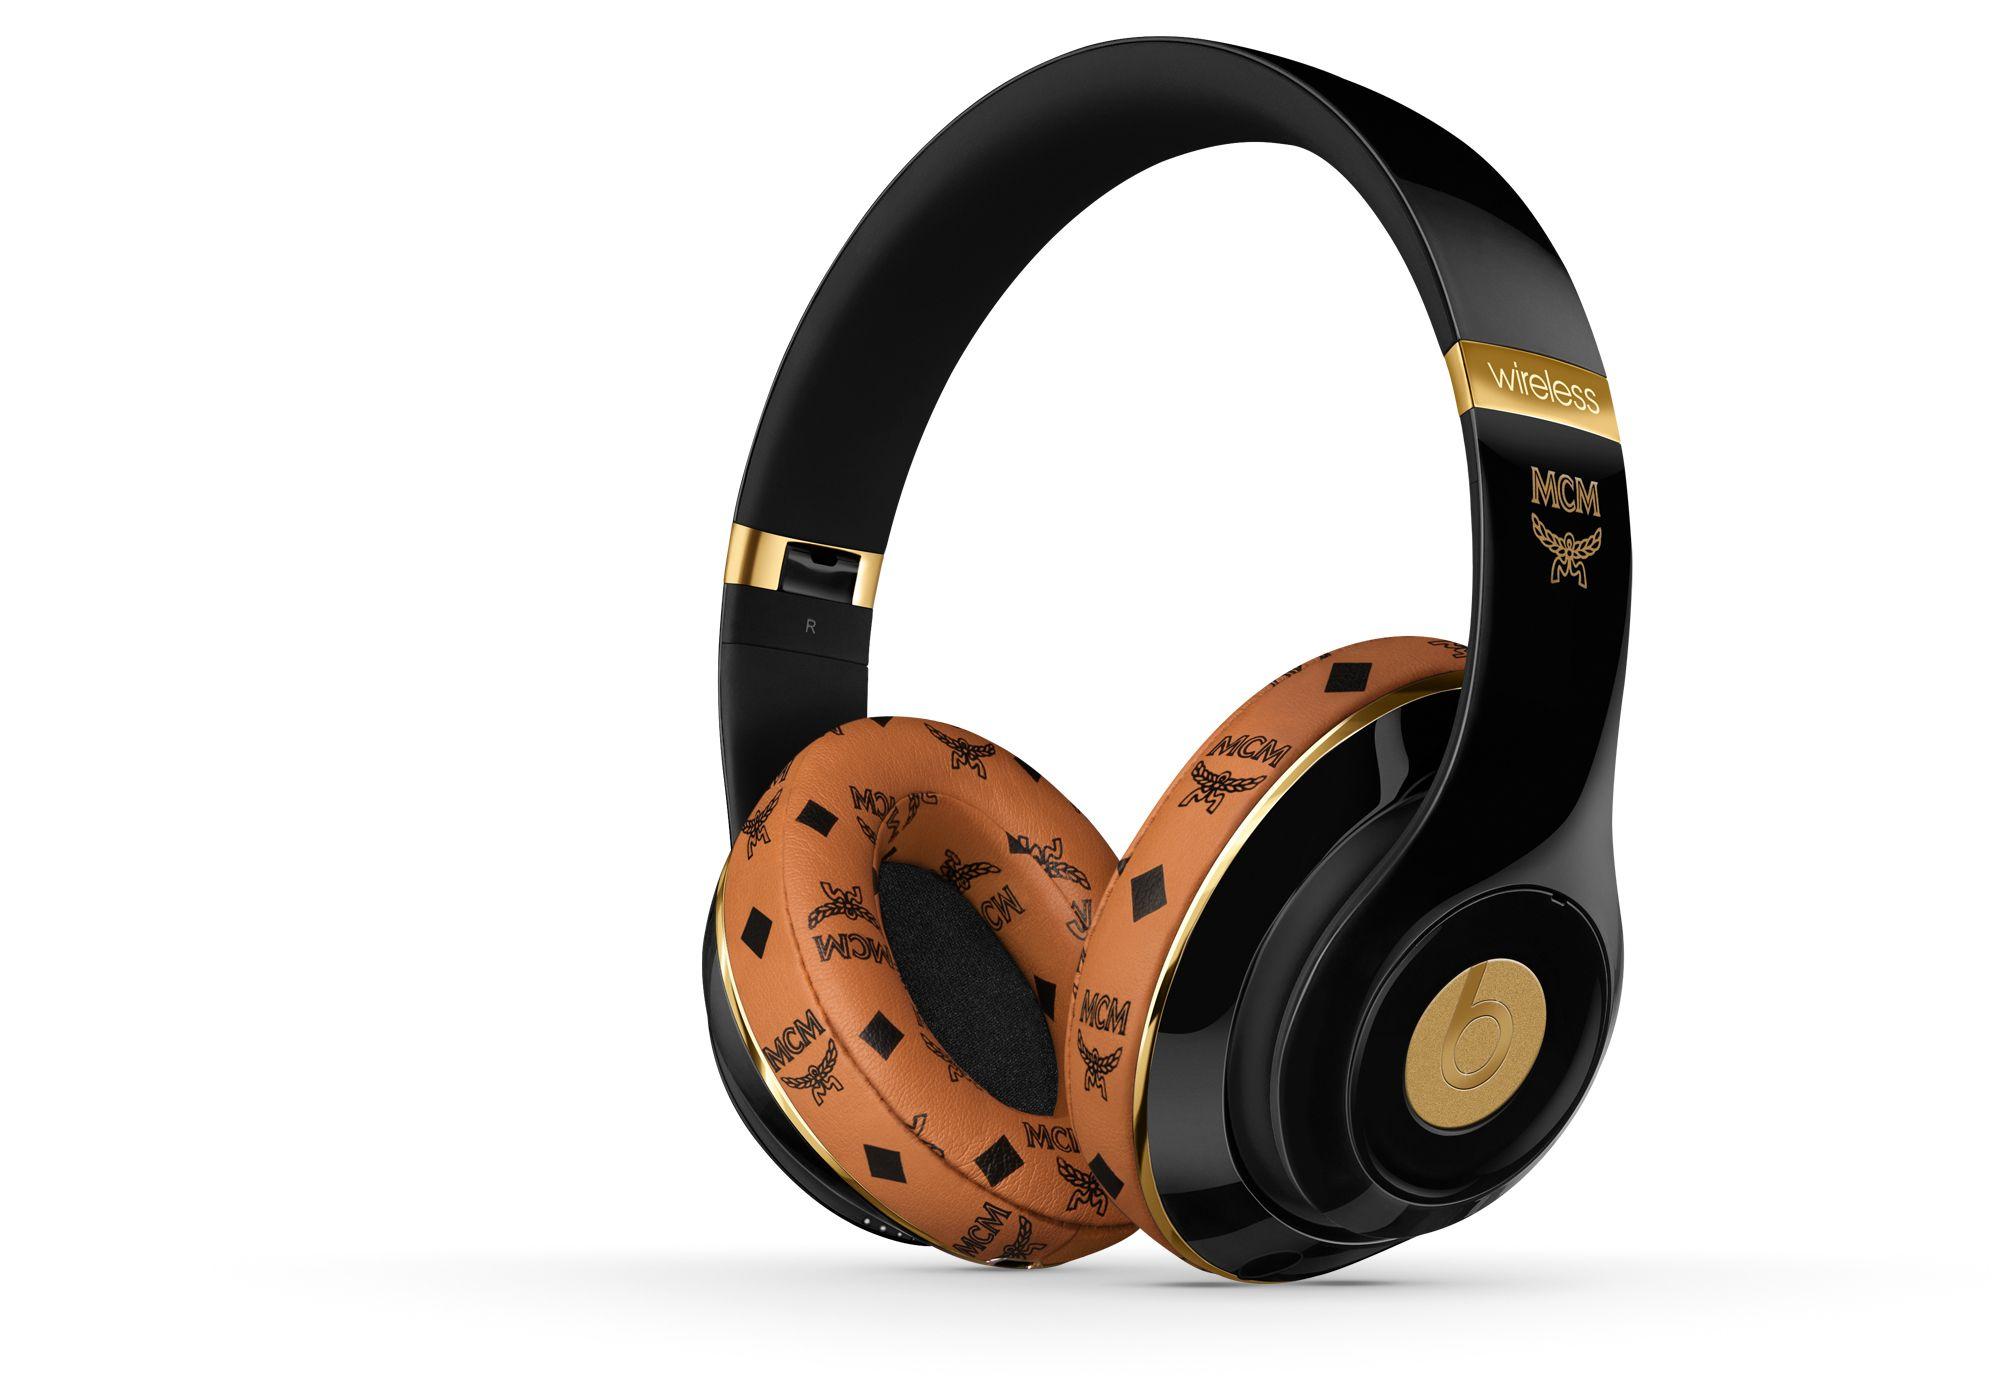 beats x mcm studio wireless beats headphones pinterest studios headphones and beats. Black Bedroom Furniture Sets. Home Design Ideas